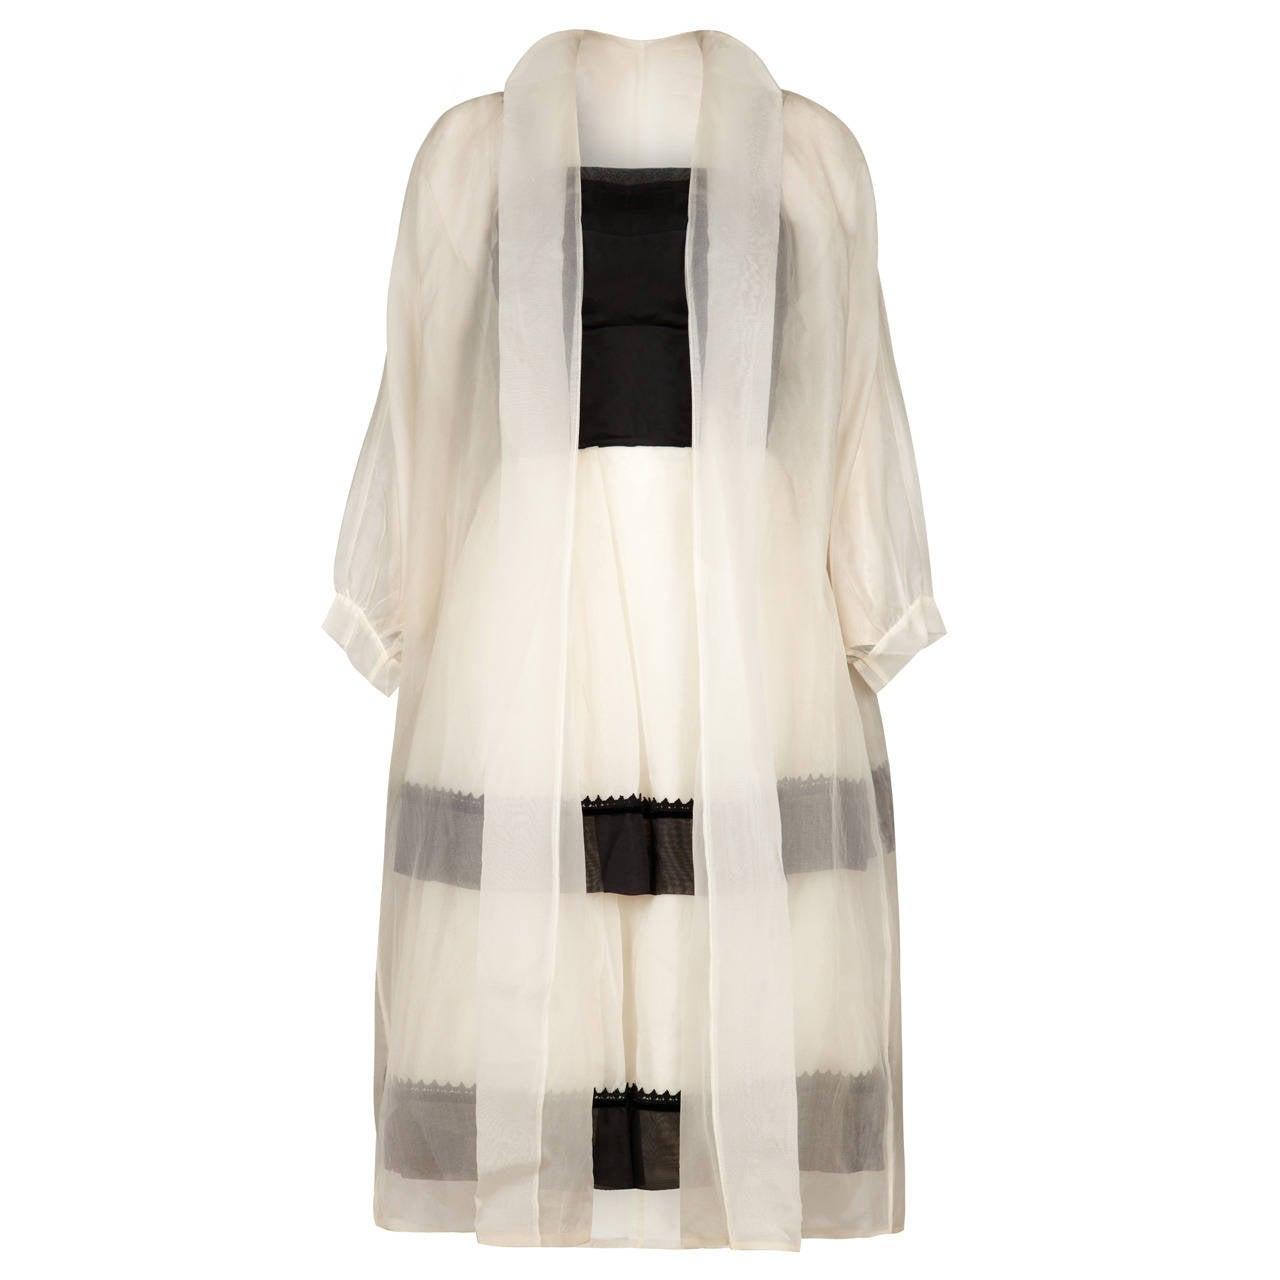 1950s Monochrome Dress With White Silk Organza Overcoat